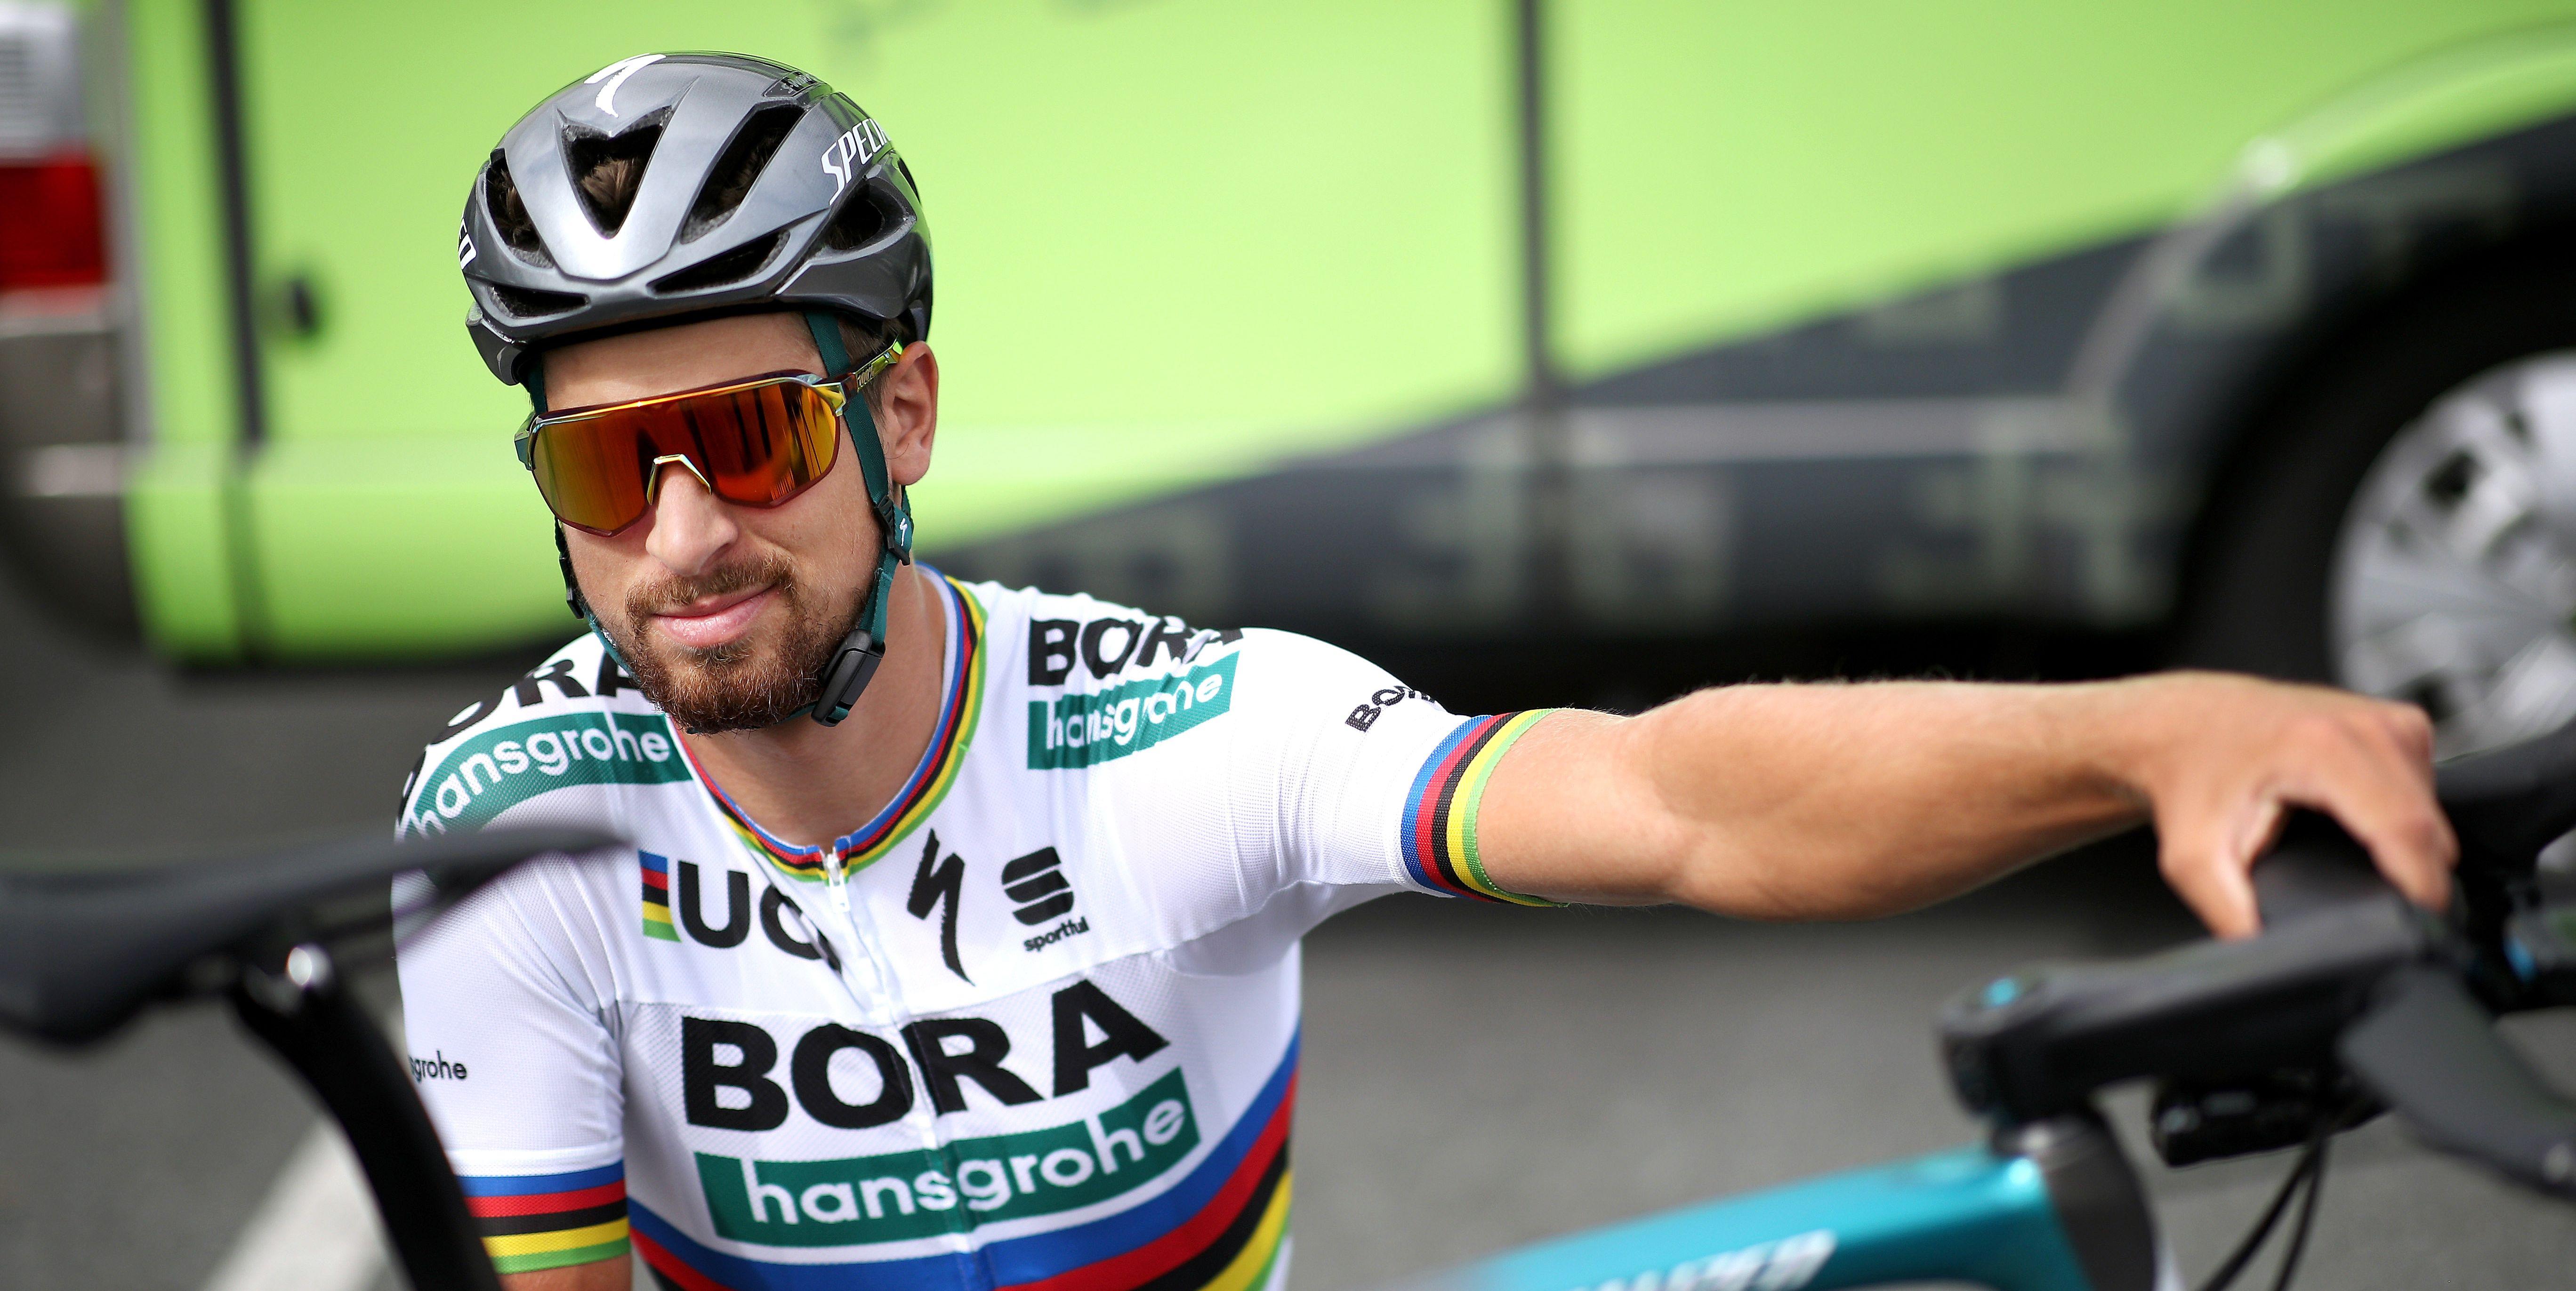 Tour De France 2018 Gear Tech What The Teams Are Wearing